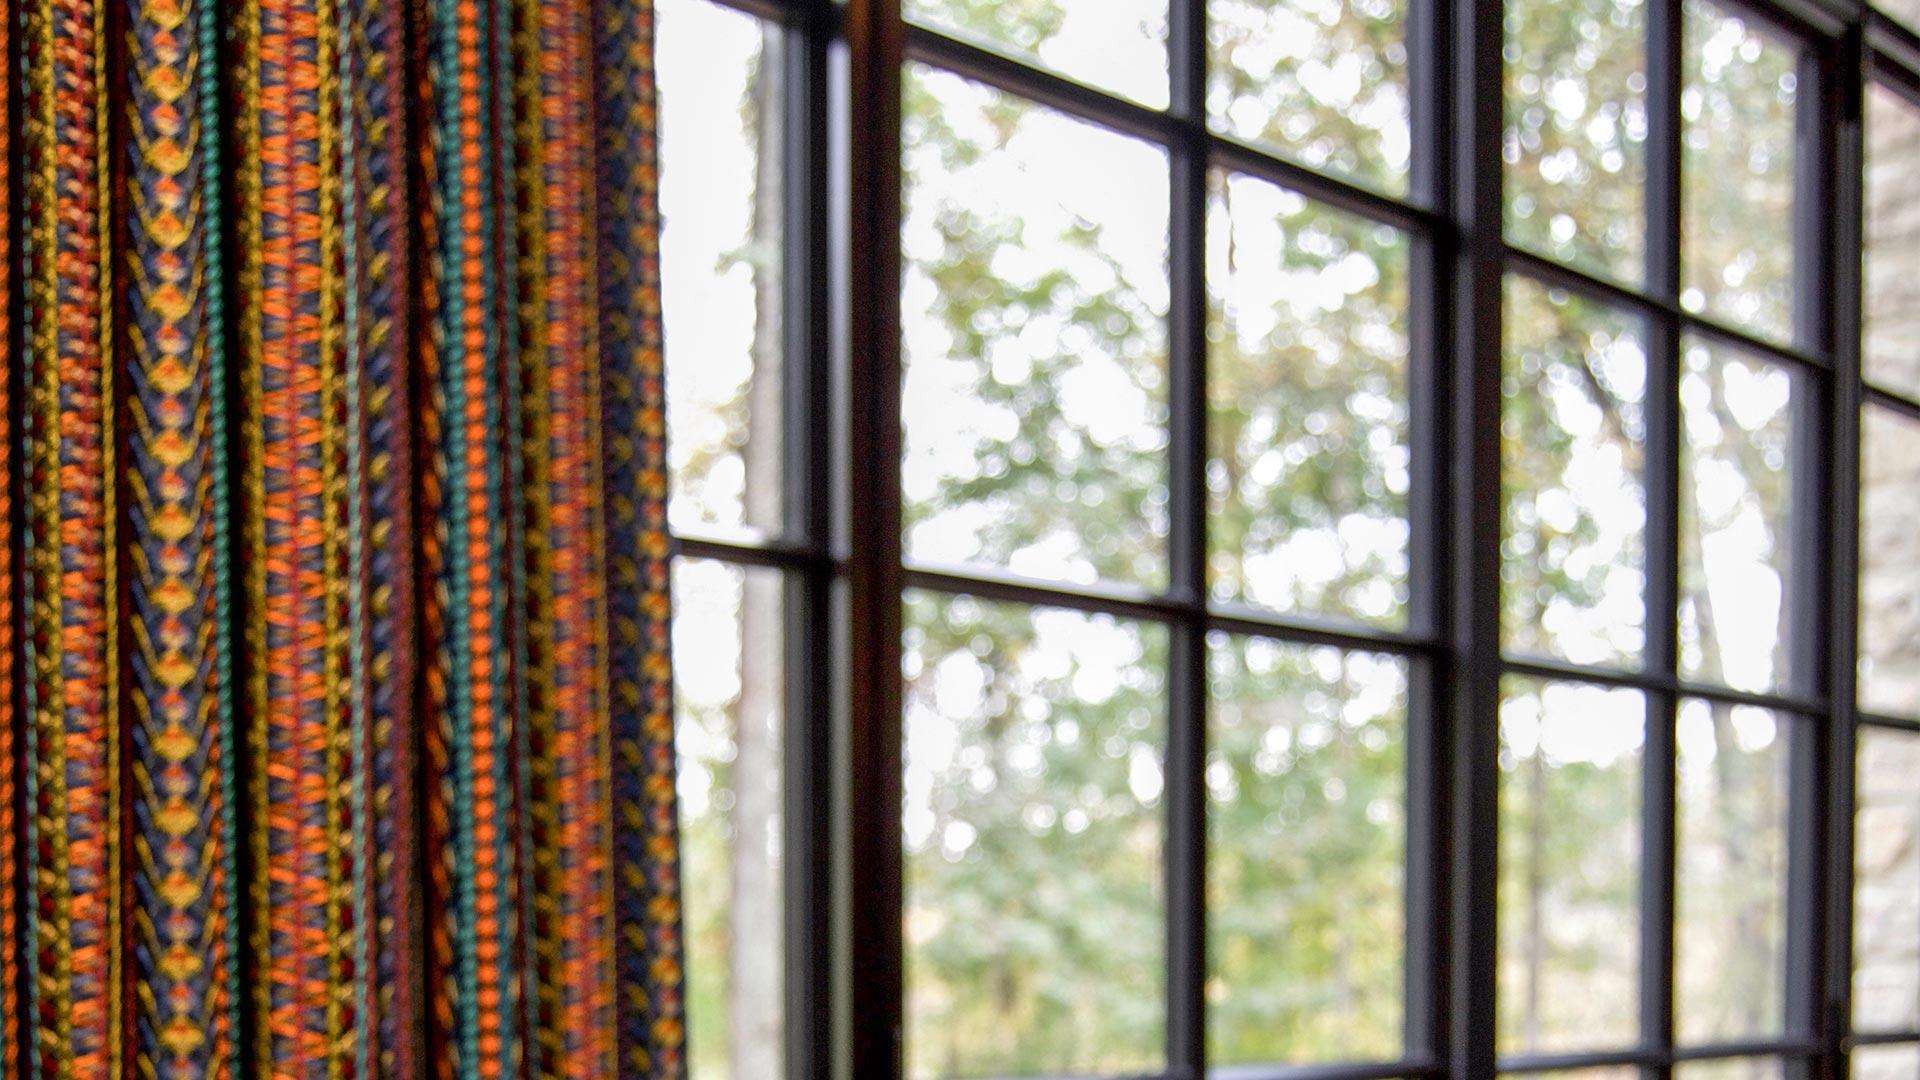 Steel glazed windows with curtains